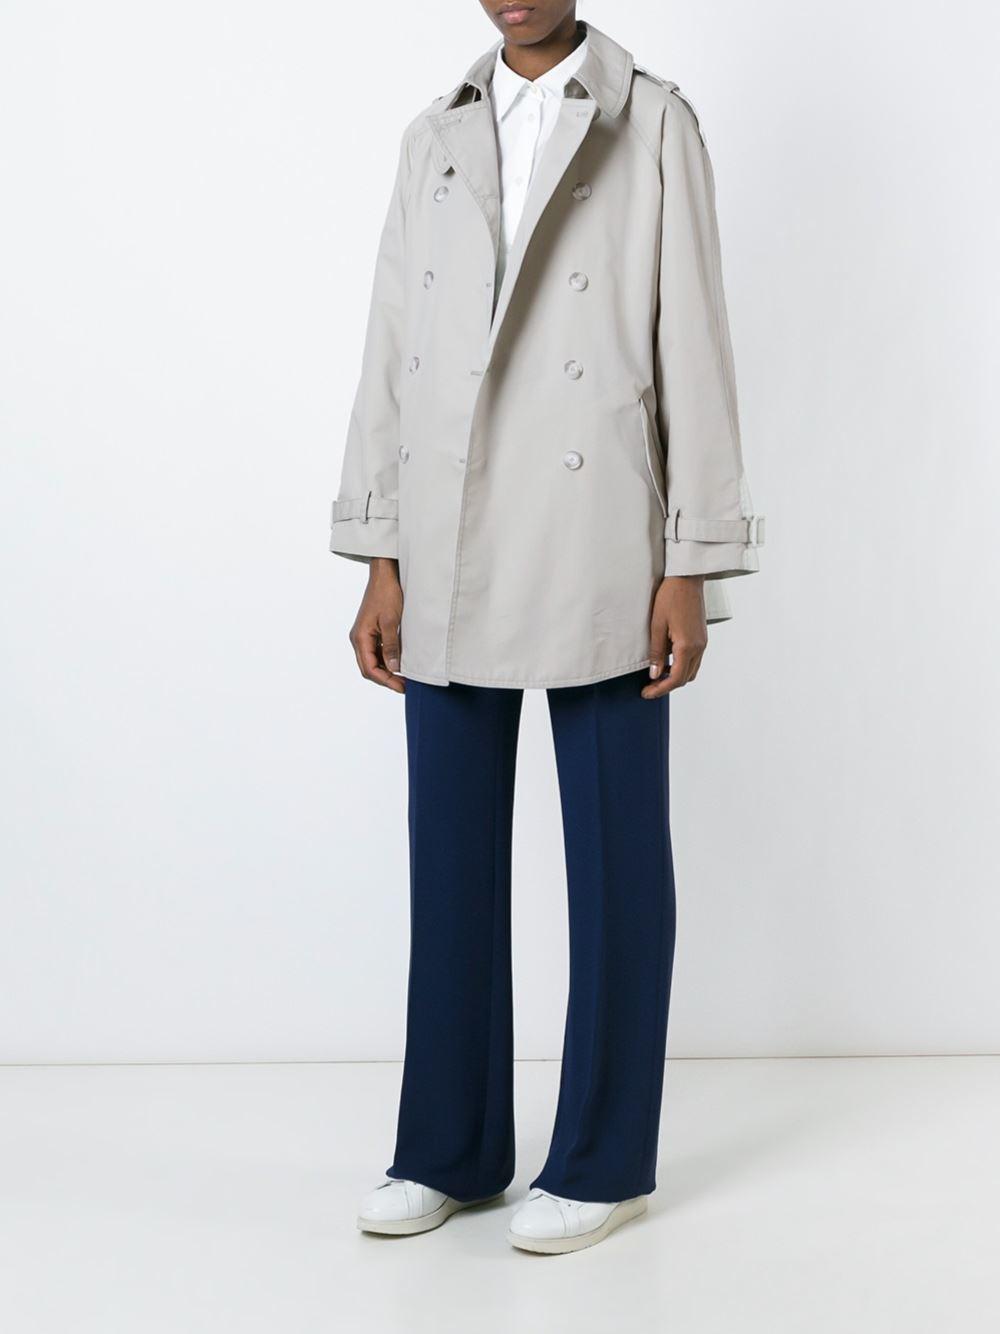 Stella Mccartney A Line Trench Coat In Blue Lyst